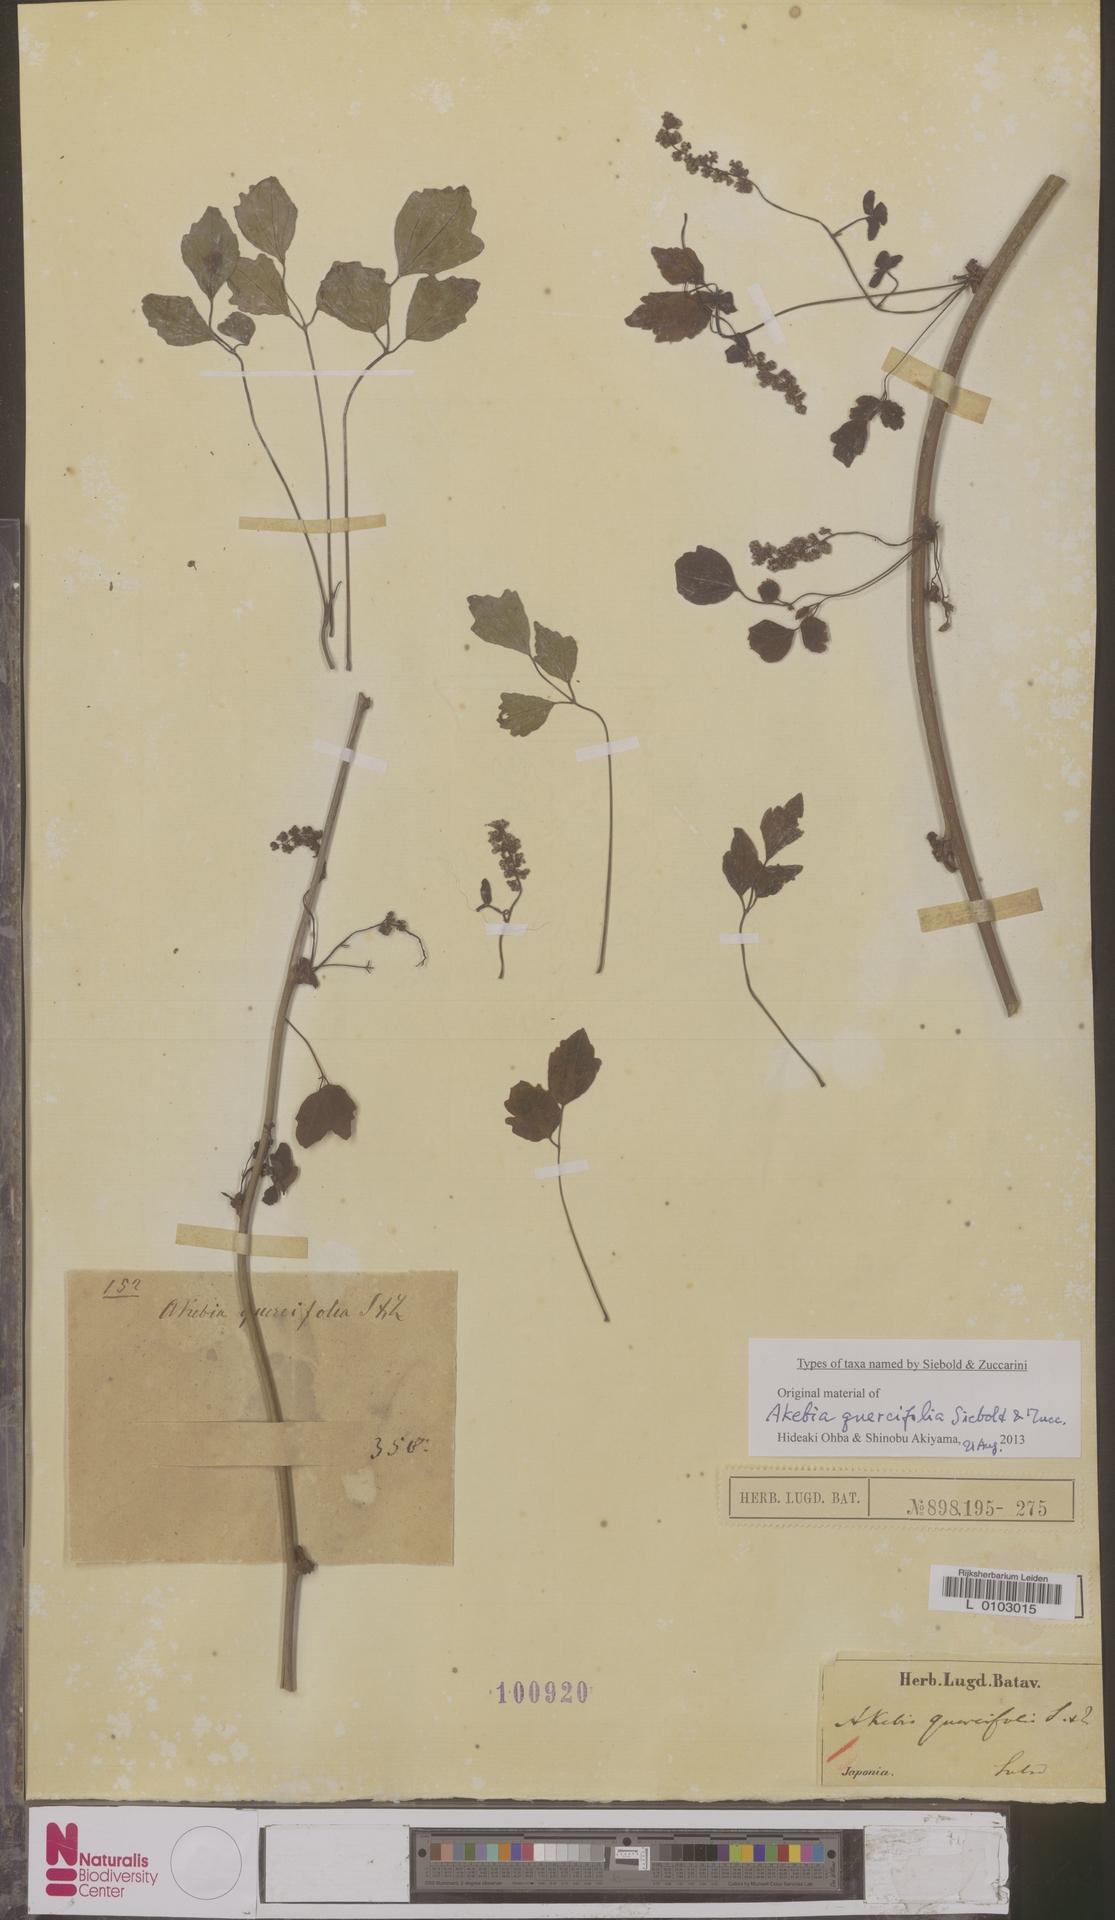 L  0103015 | Akebia quercifolia Siebold & Zucc.